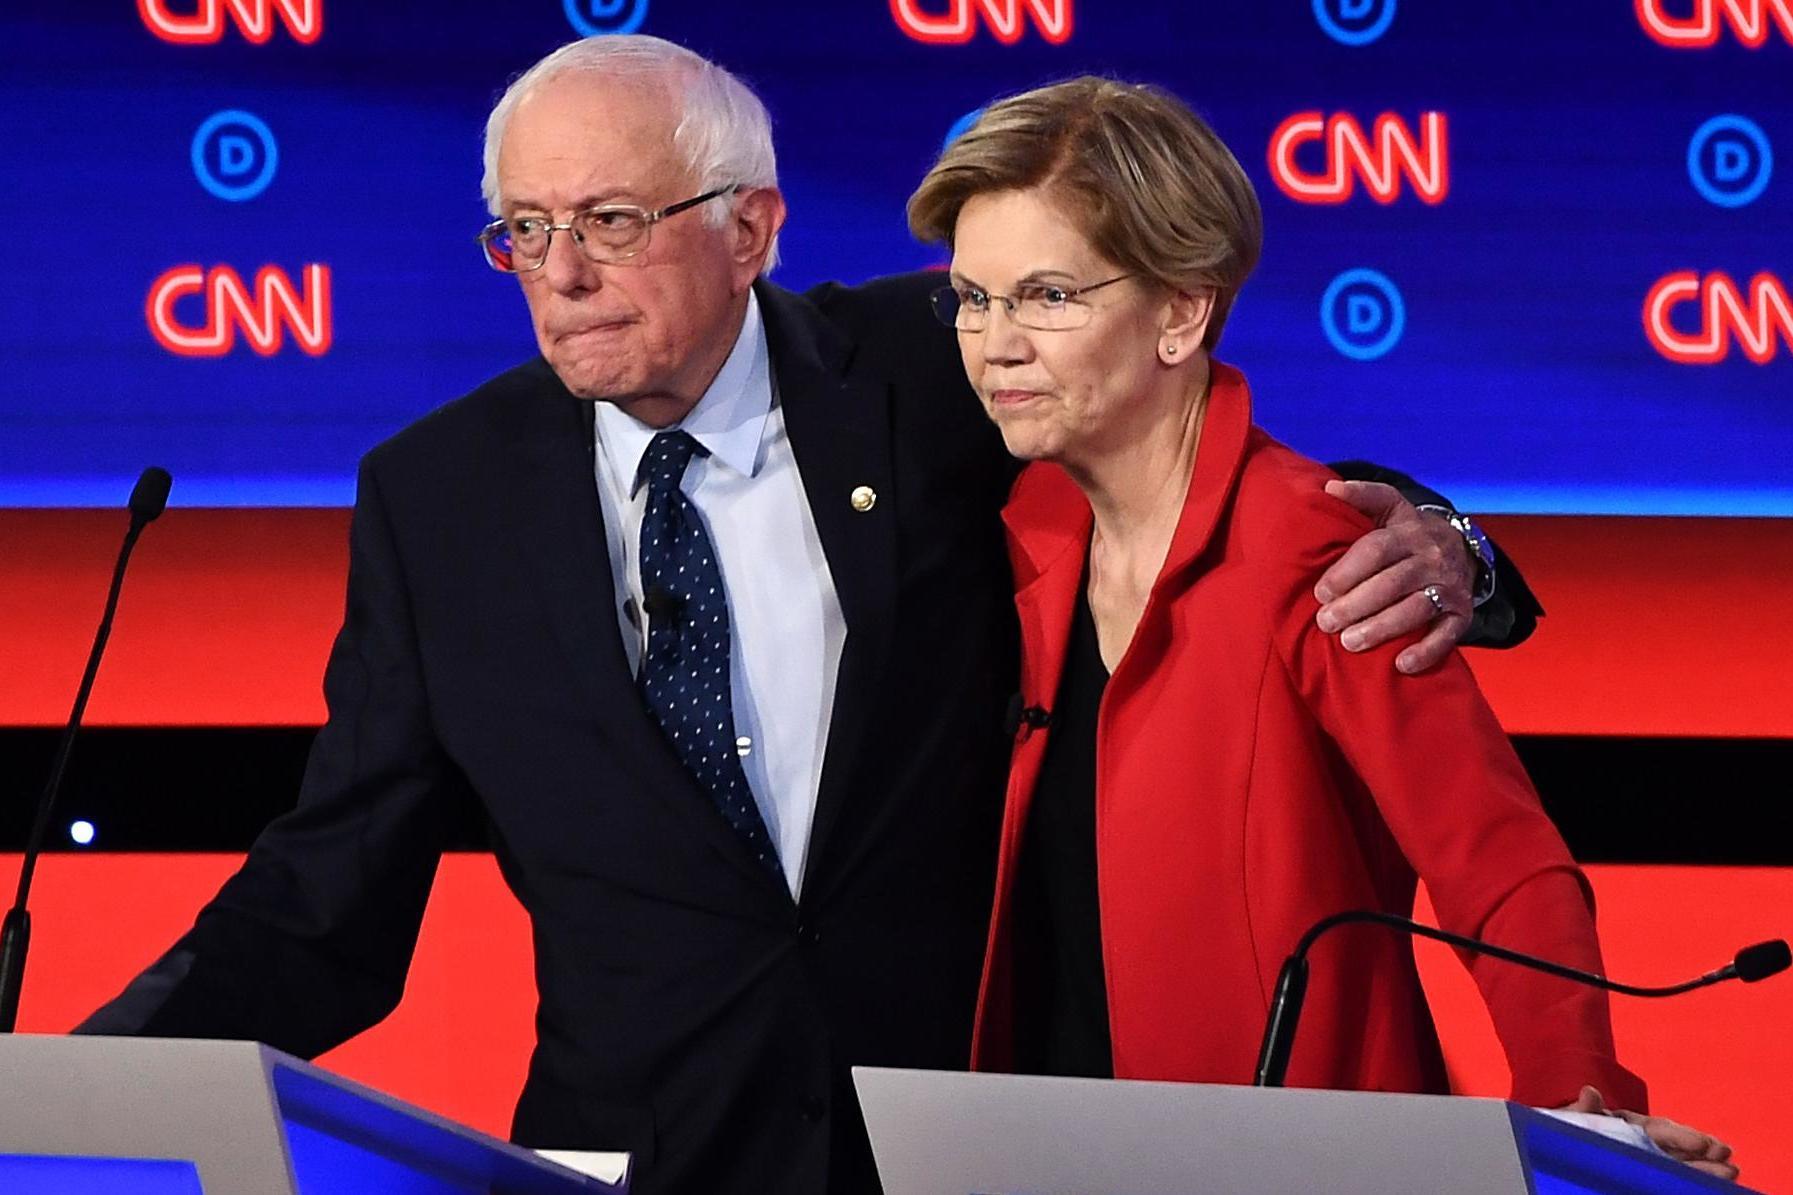 Democratic debate - live: Biden, Sanders and Warren face off for first time in tonight's 2020 showdown